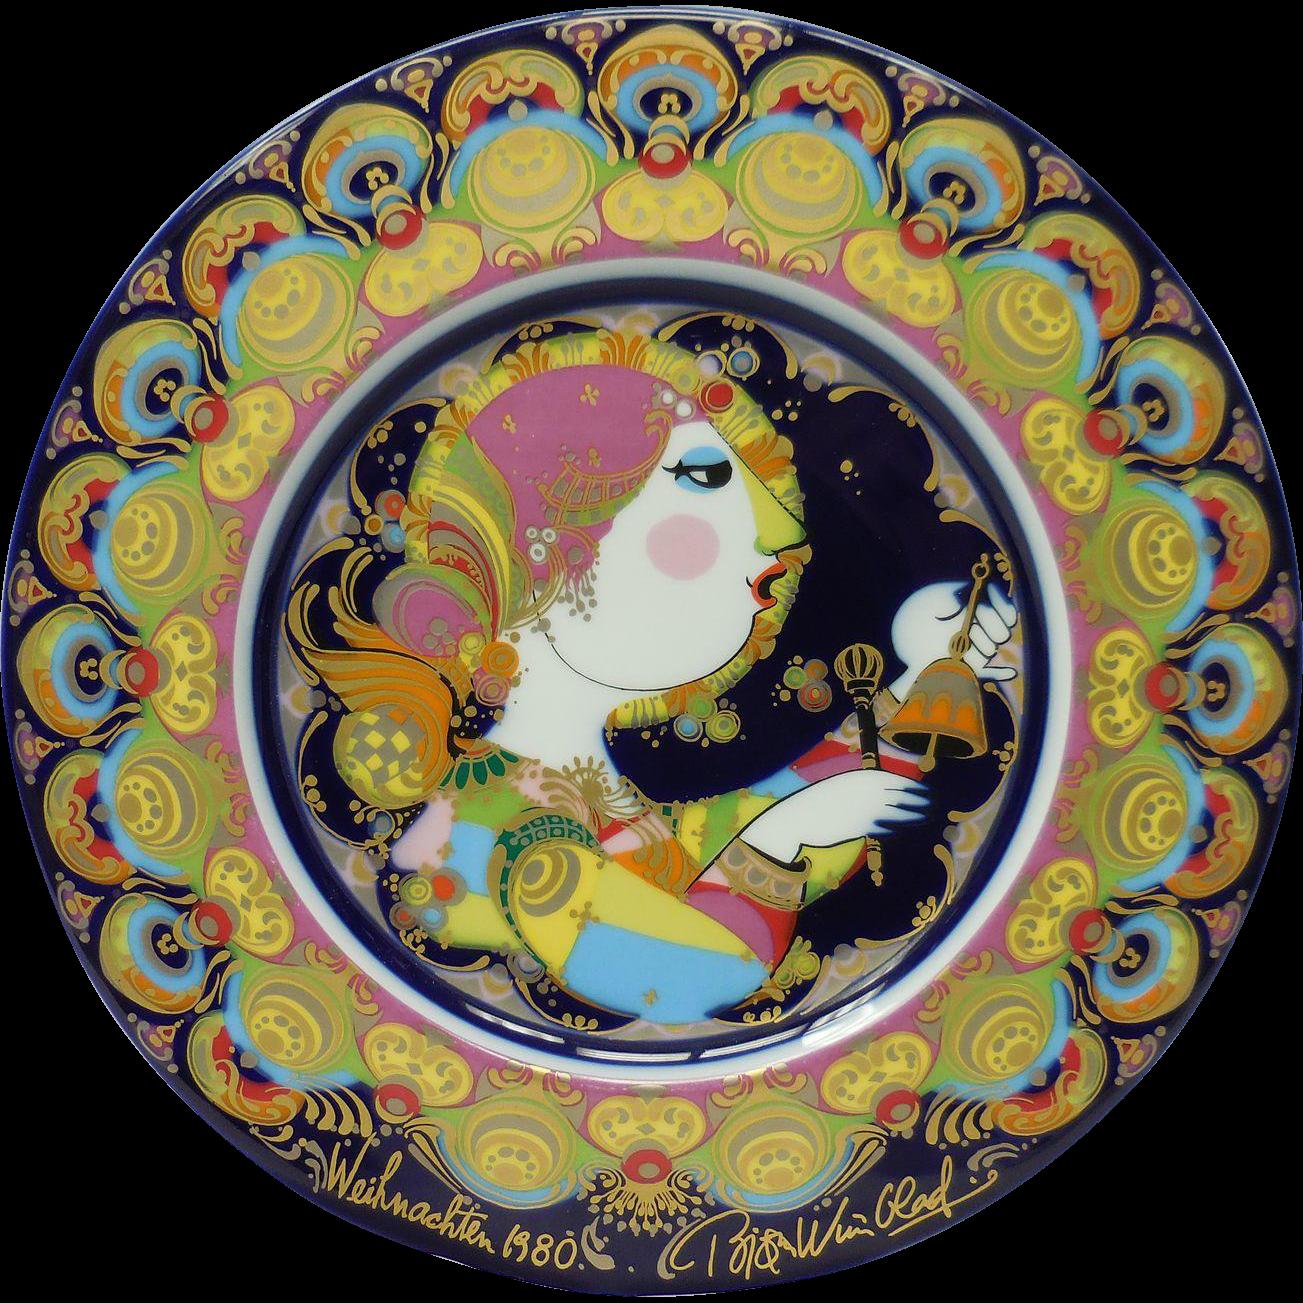 Signed Bjorn Wiinblad Studio Line Rosenthal Decorative Plate – Weihnachtsteller (Christmas) 1980 Angel With Bells